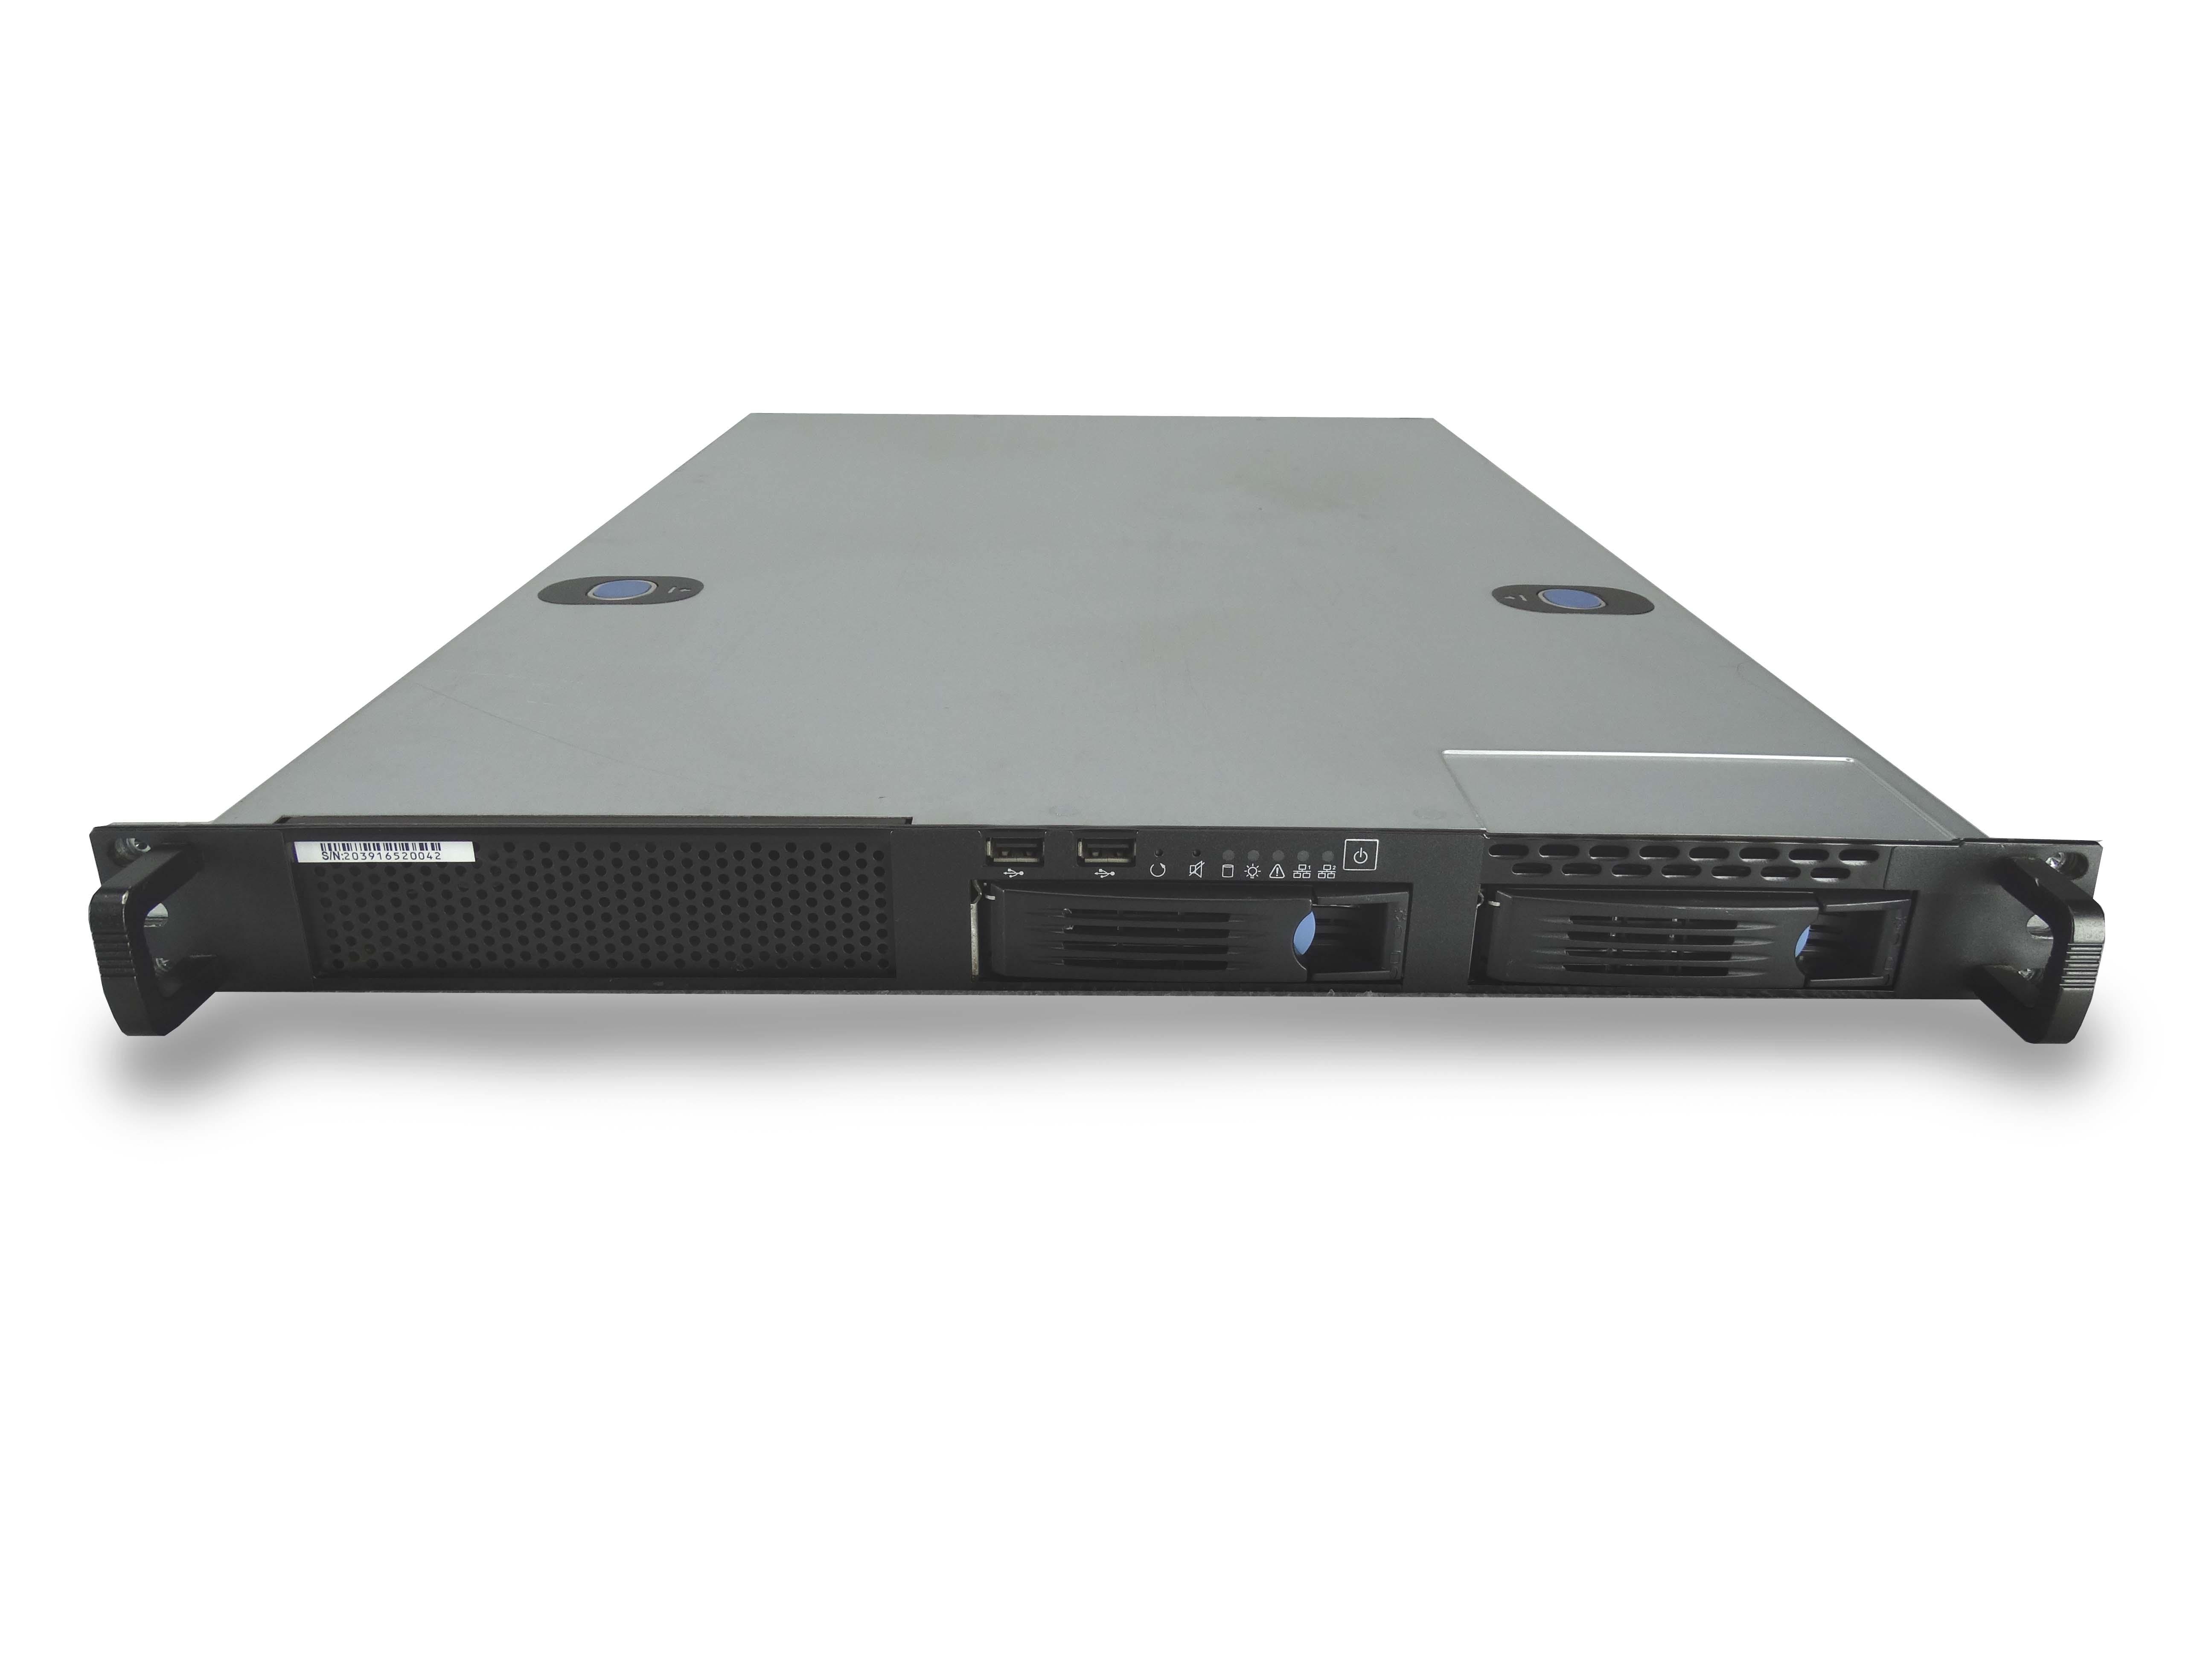 Chenbro RM11602 2-Bay LFF 1U Rackmount Server